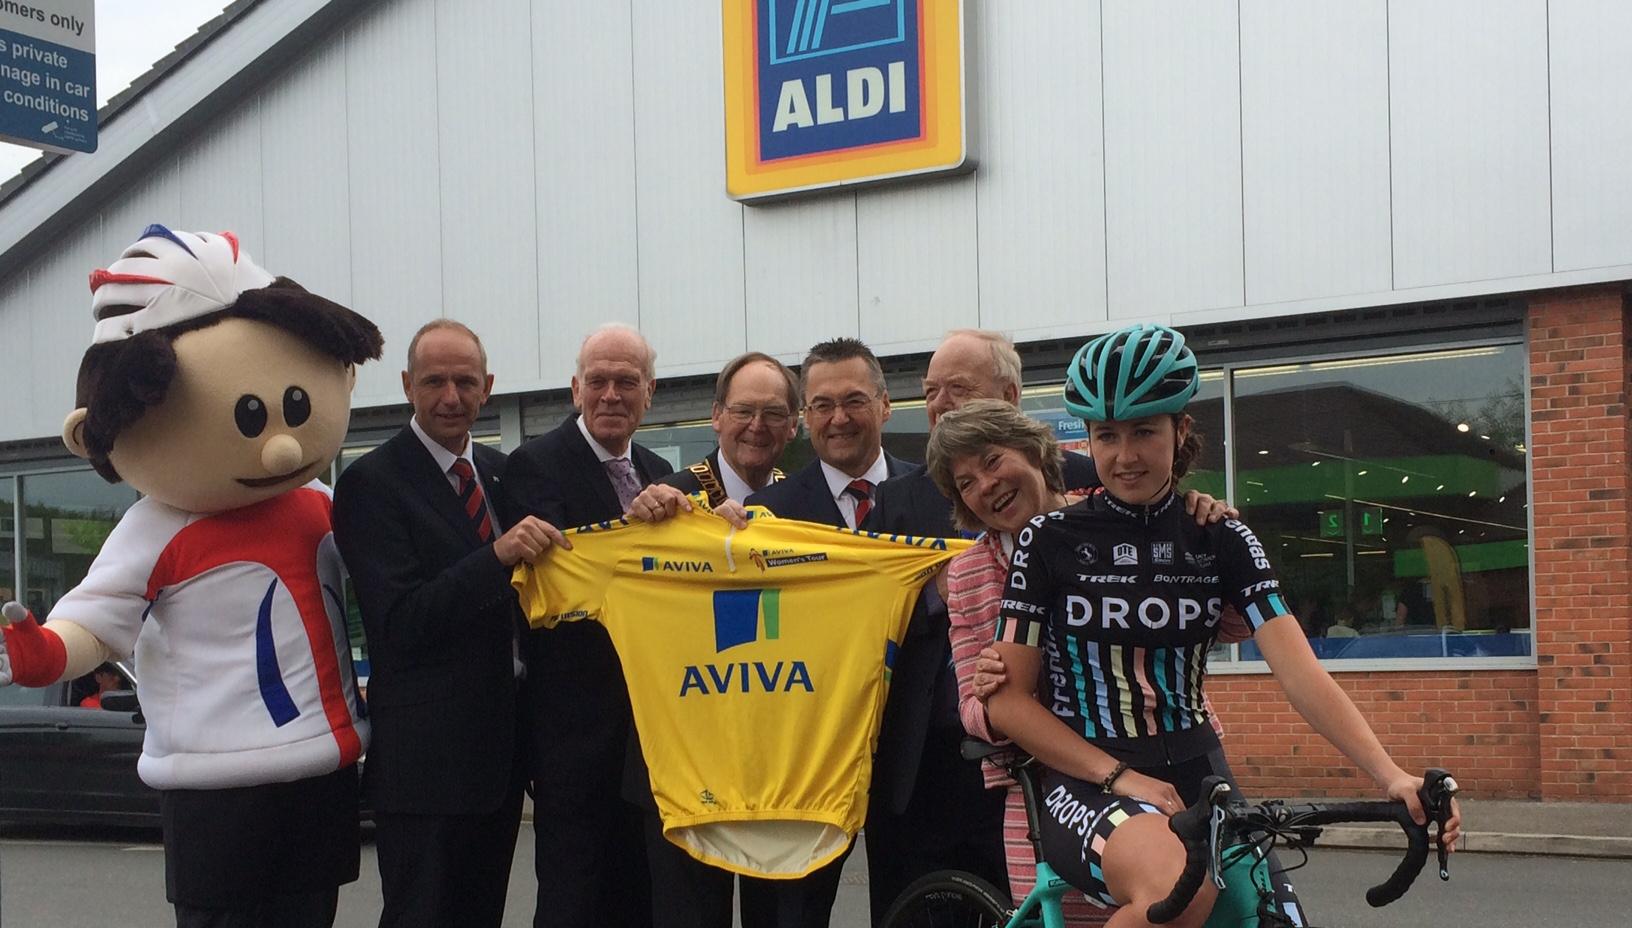 Aldi announced as major sponsors of Aviva Women's Tour in Warwickshire